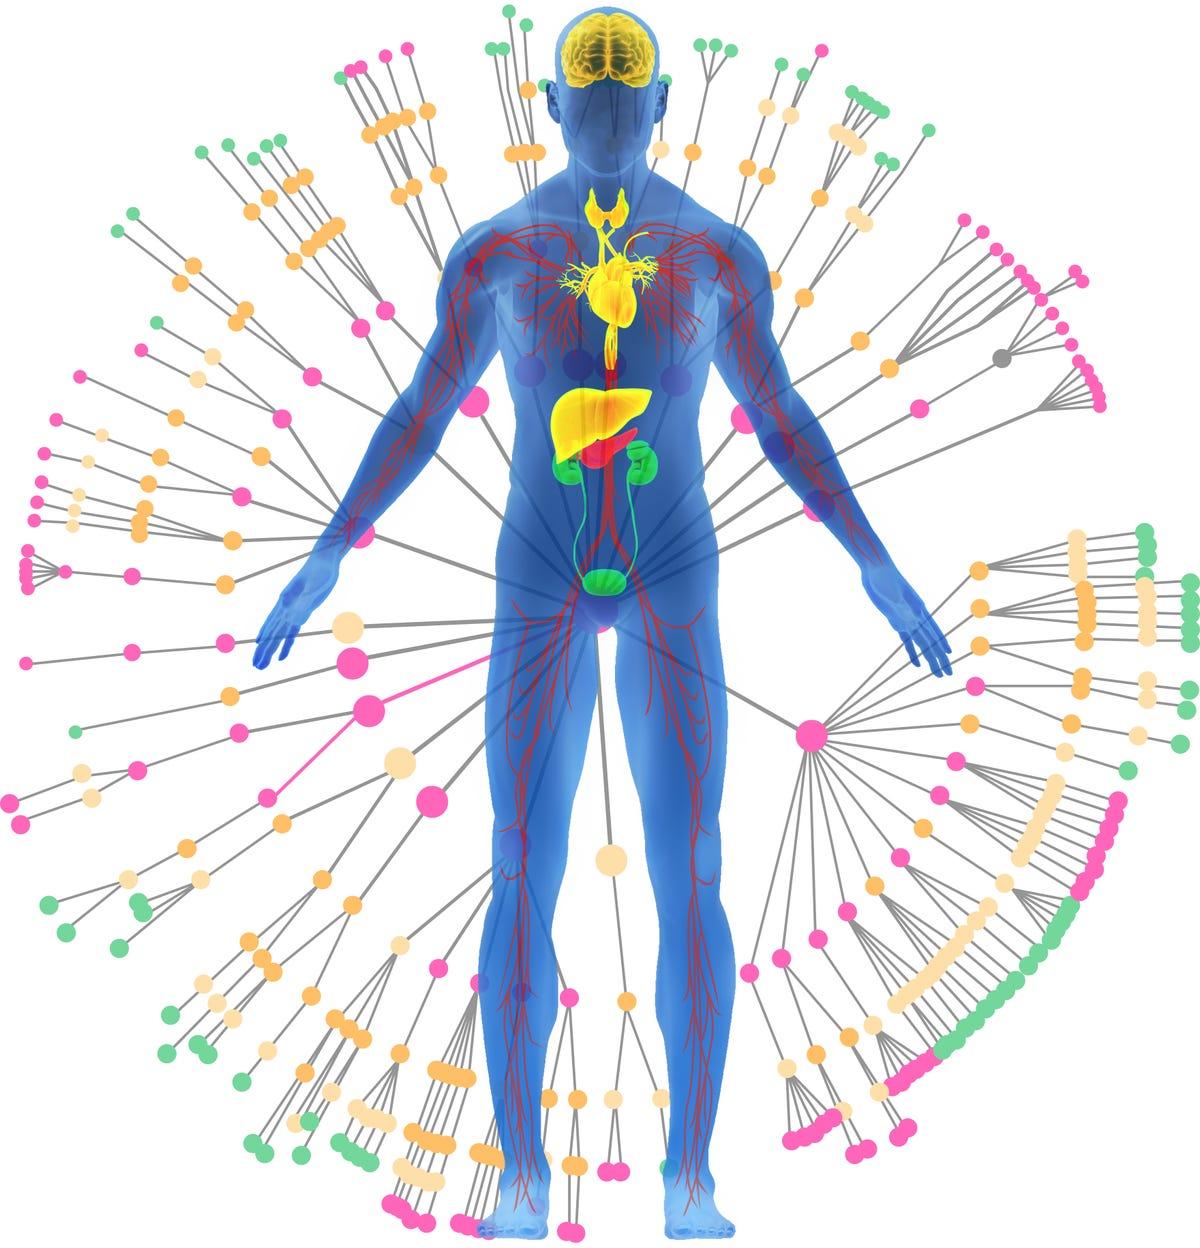 twin-health-2021-whole-body-digital-twin.png